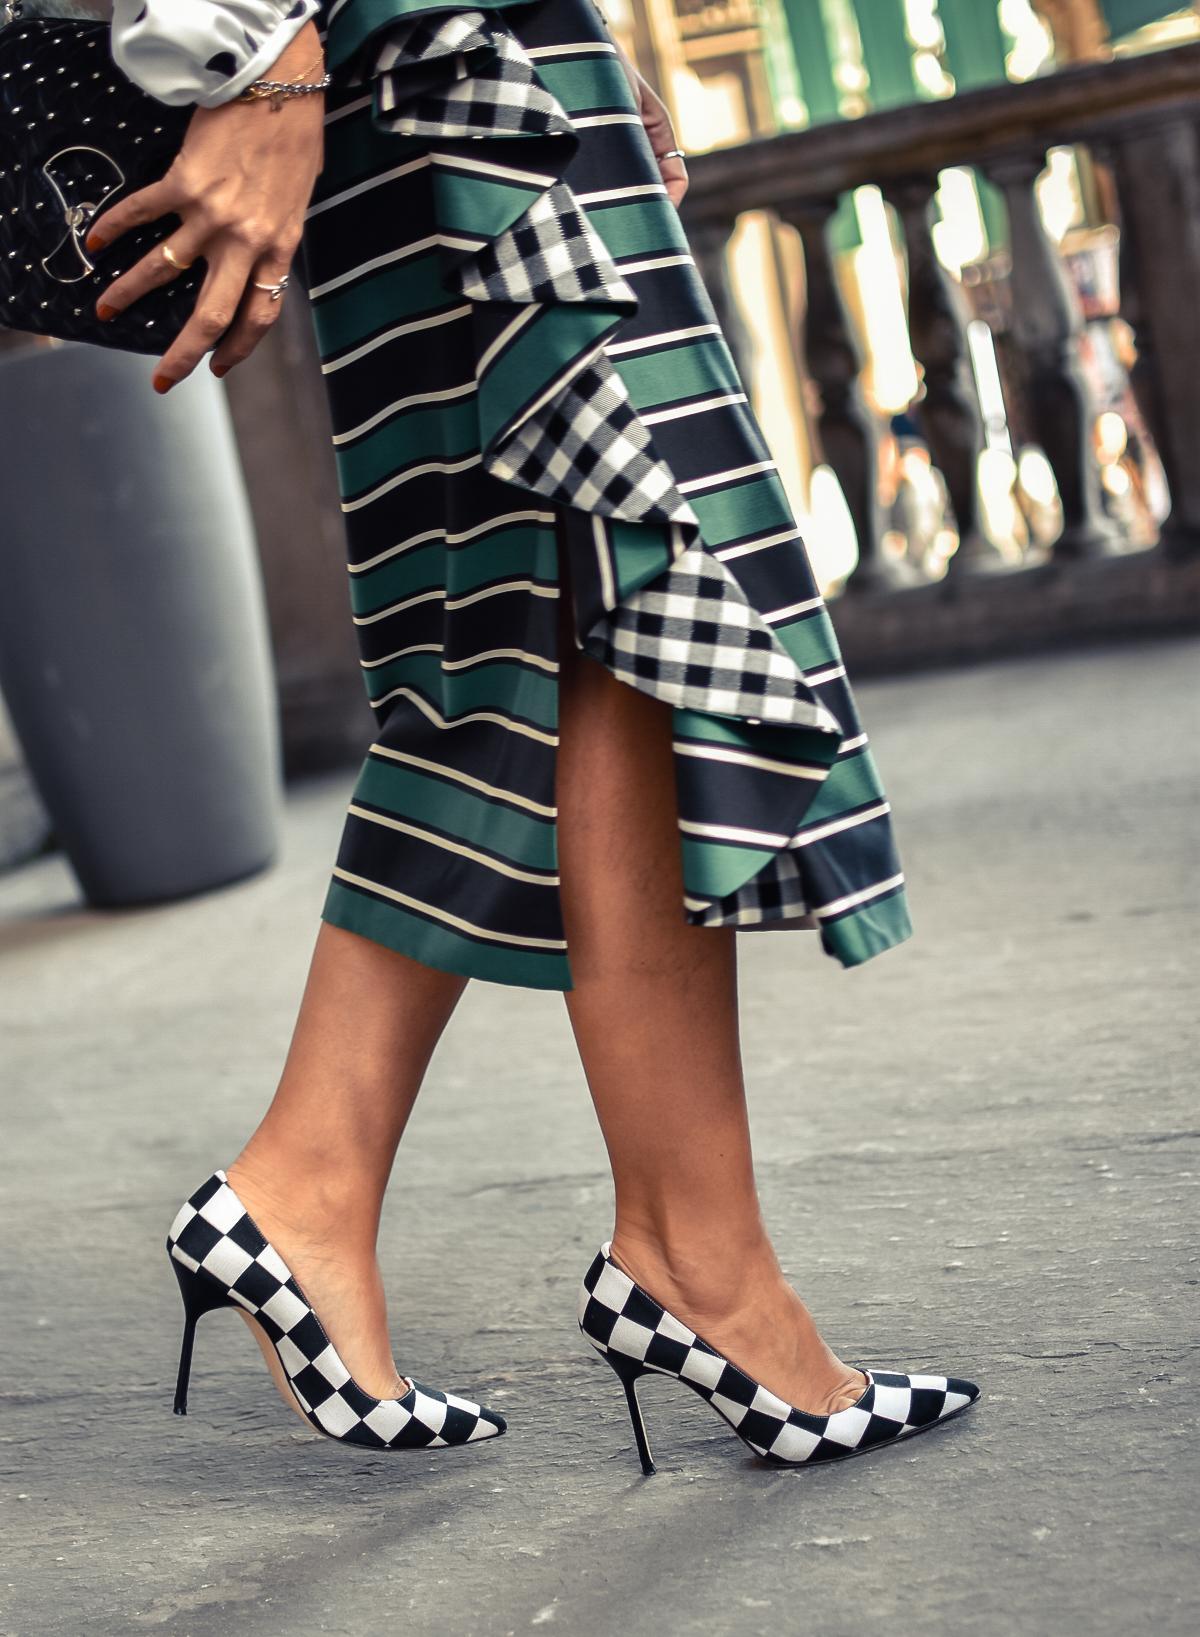 el-blog-de-silvia-mfw-milan-fashion-week-street-style-falda-rayas-manolo-blahnik-02